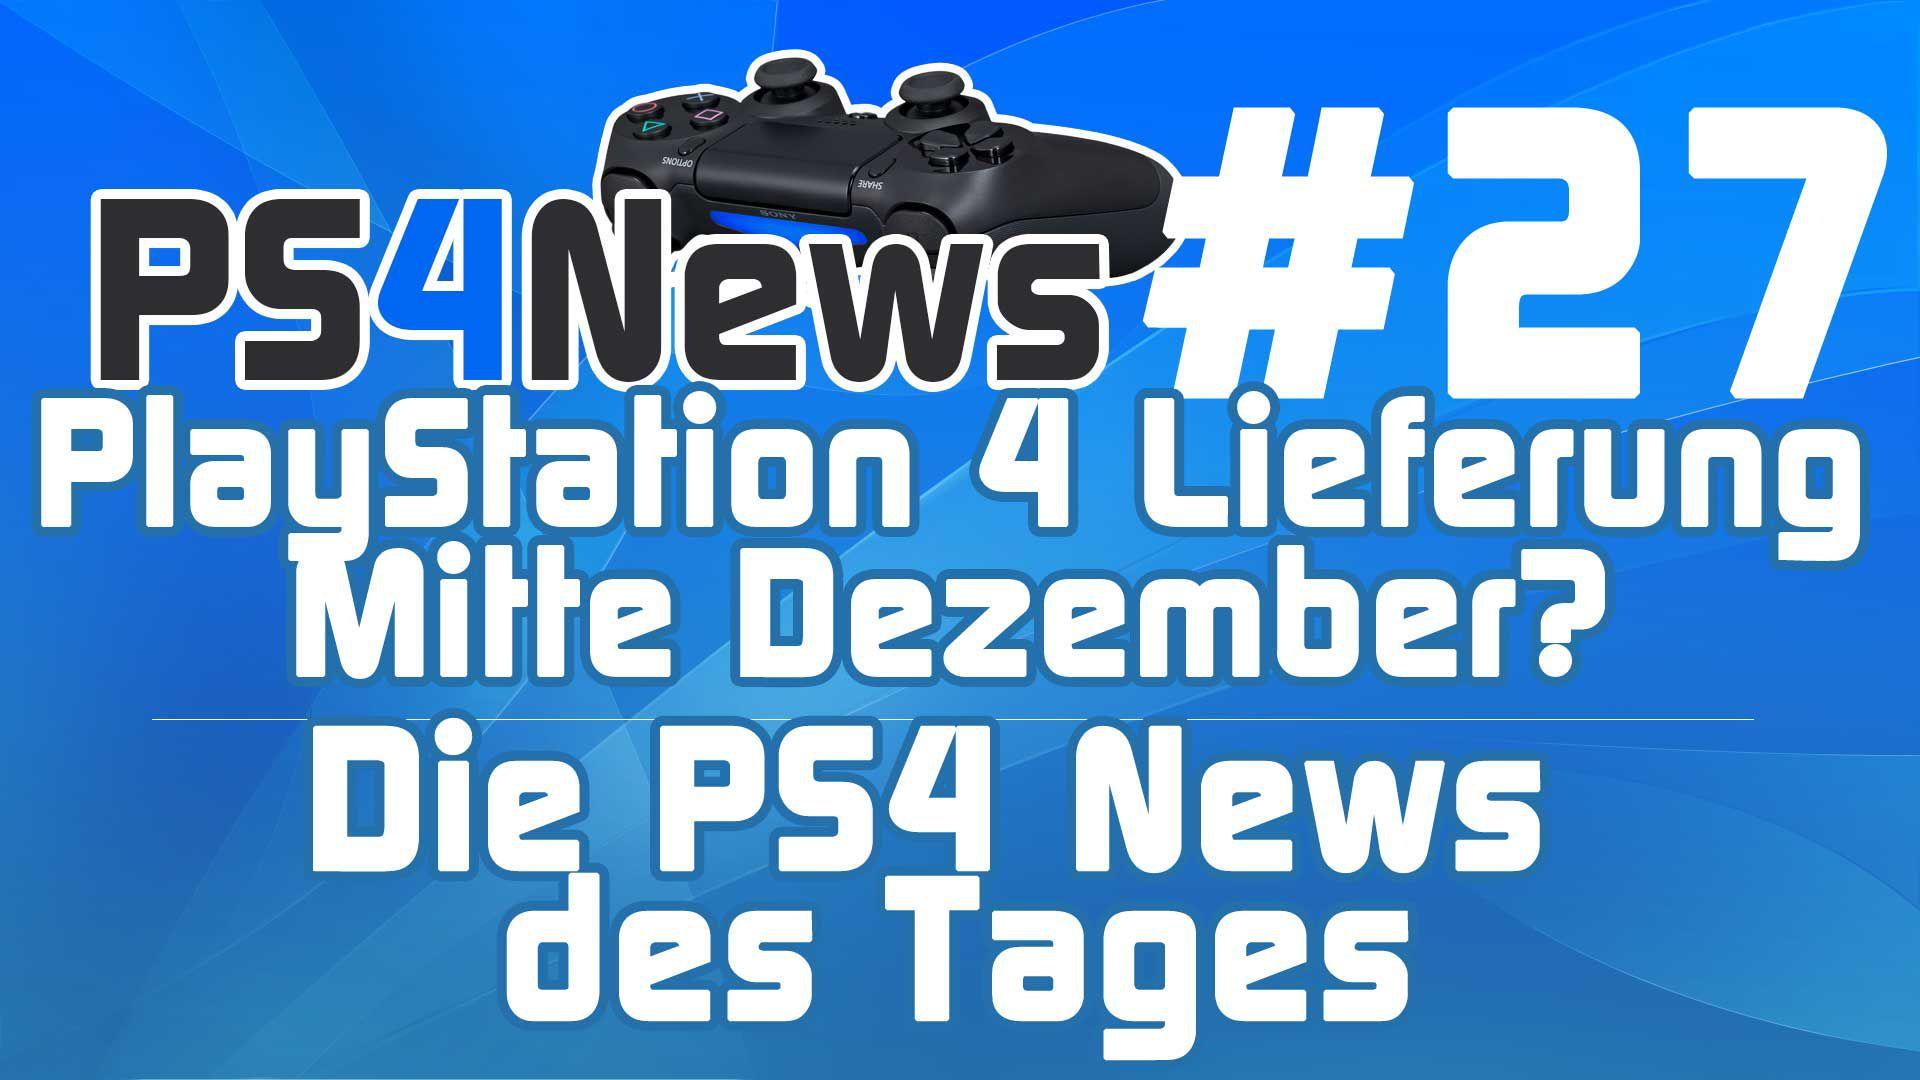 Neue PS4 Lieferung Mitte Dezember? GameStop schnürt teure PS4 Bundles uvm.